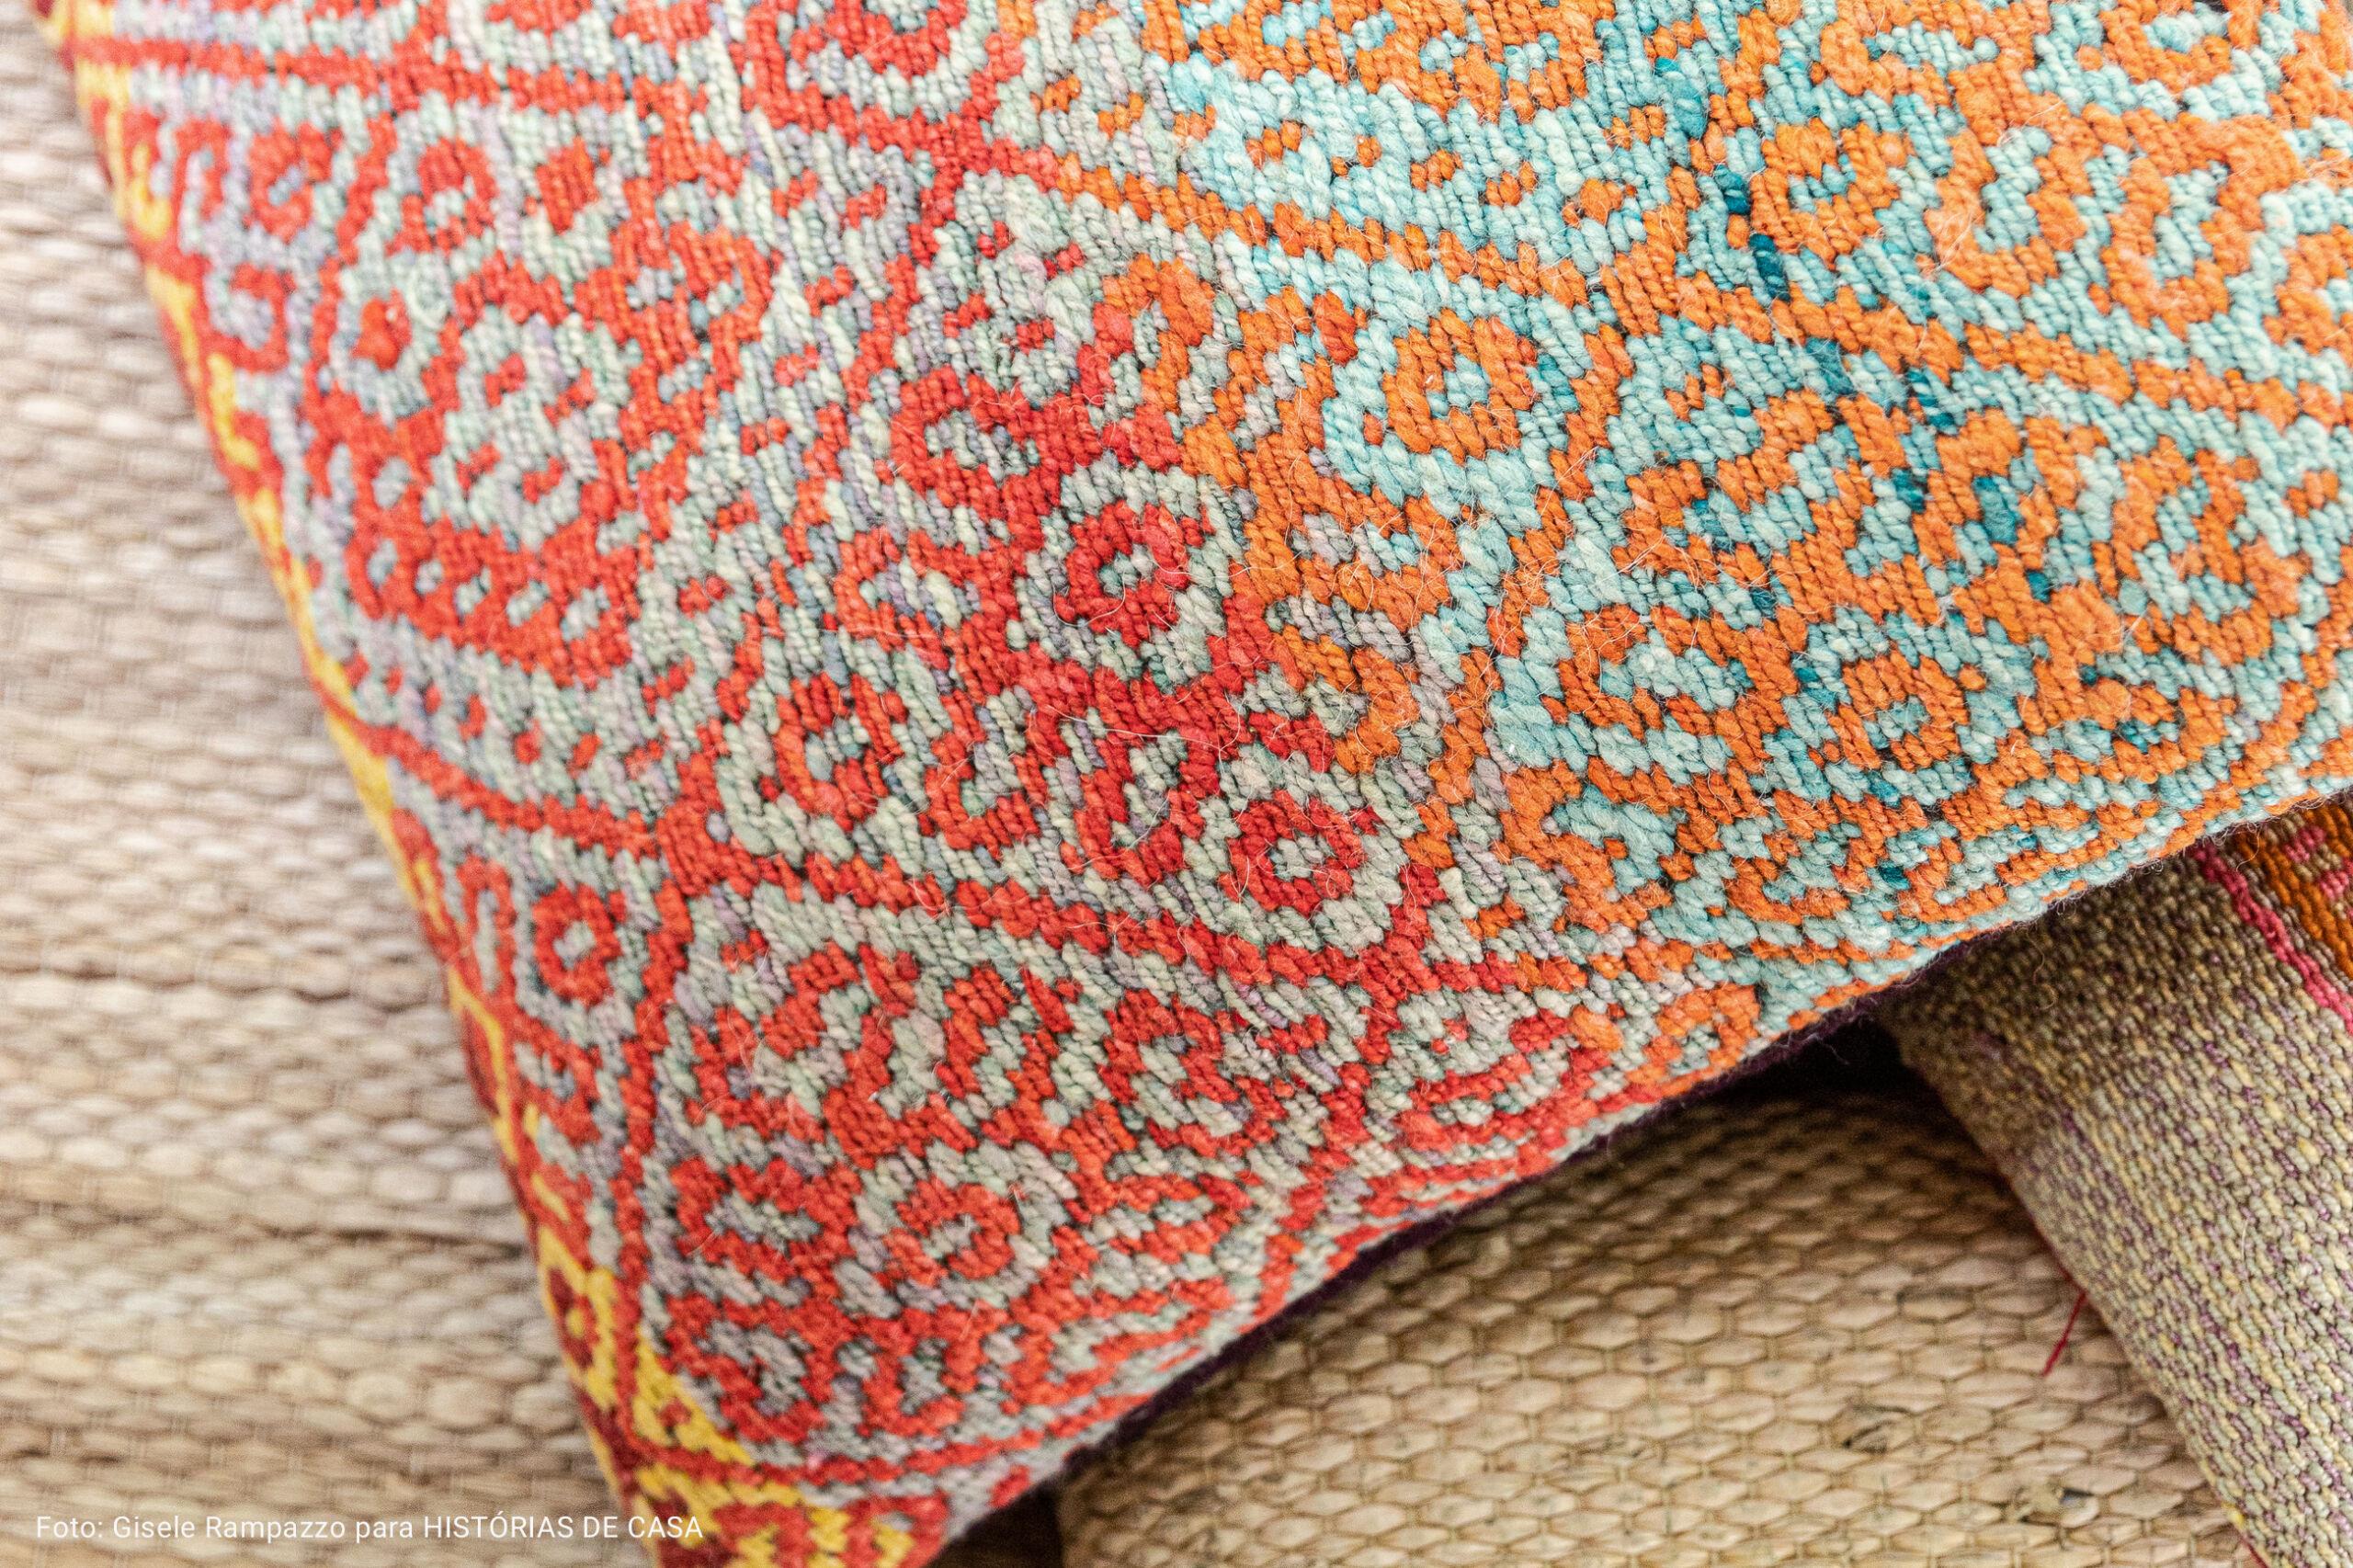 Almofadas com texturas naturais